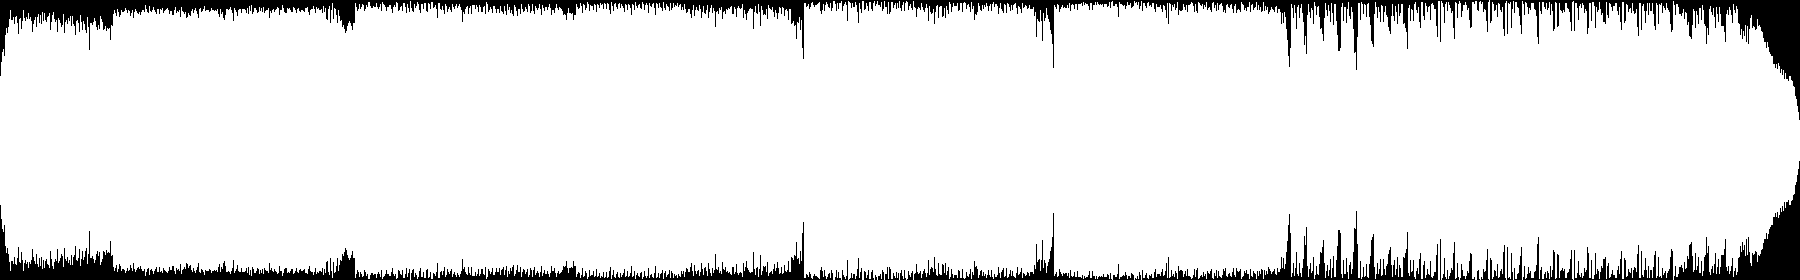 INSANE Serum Soundset audio waveform